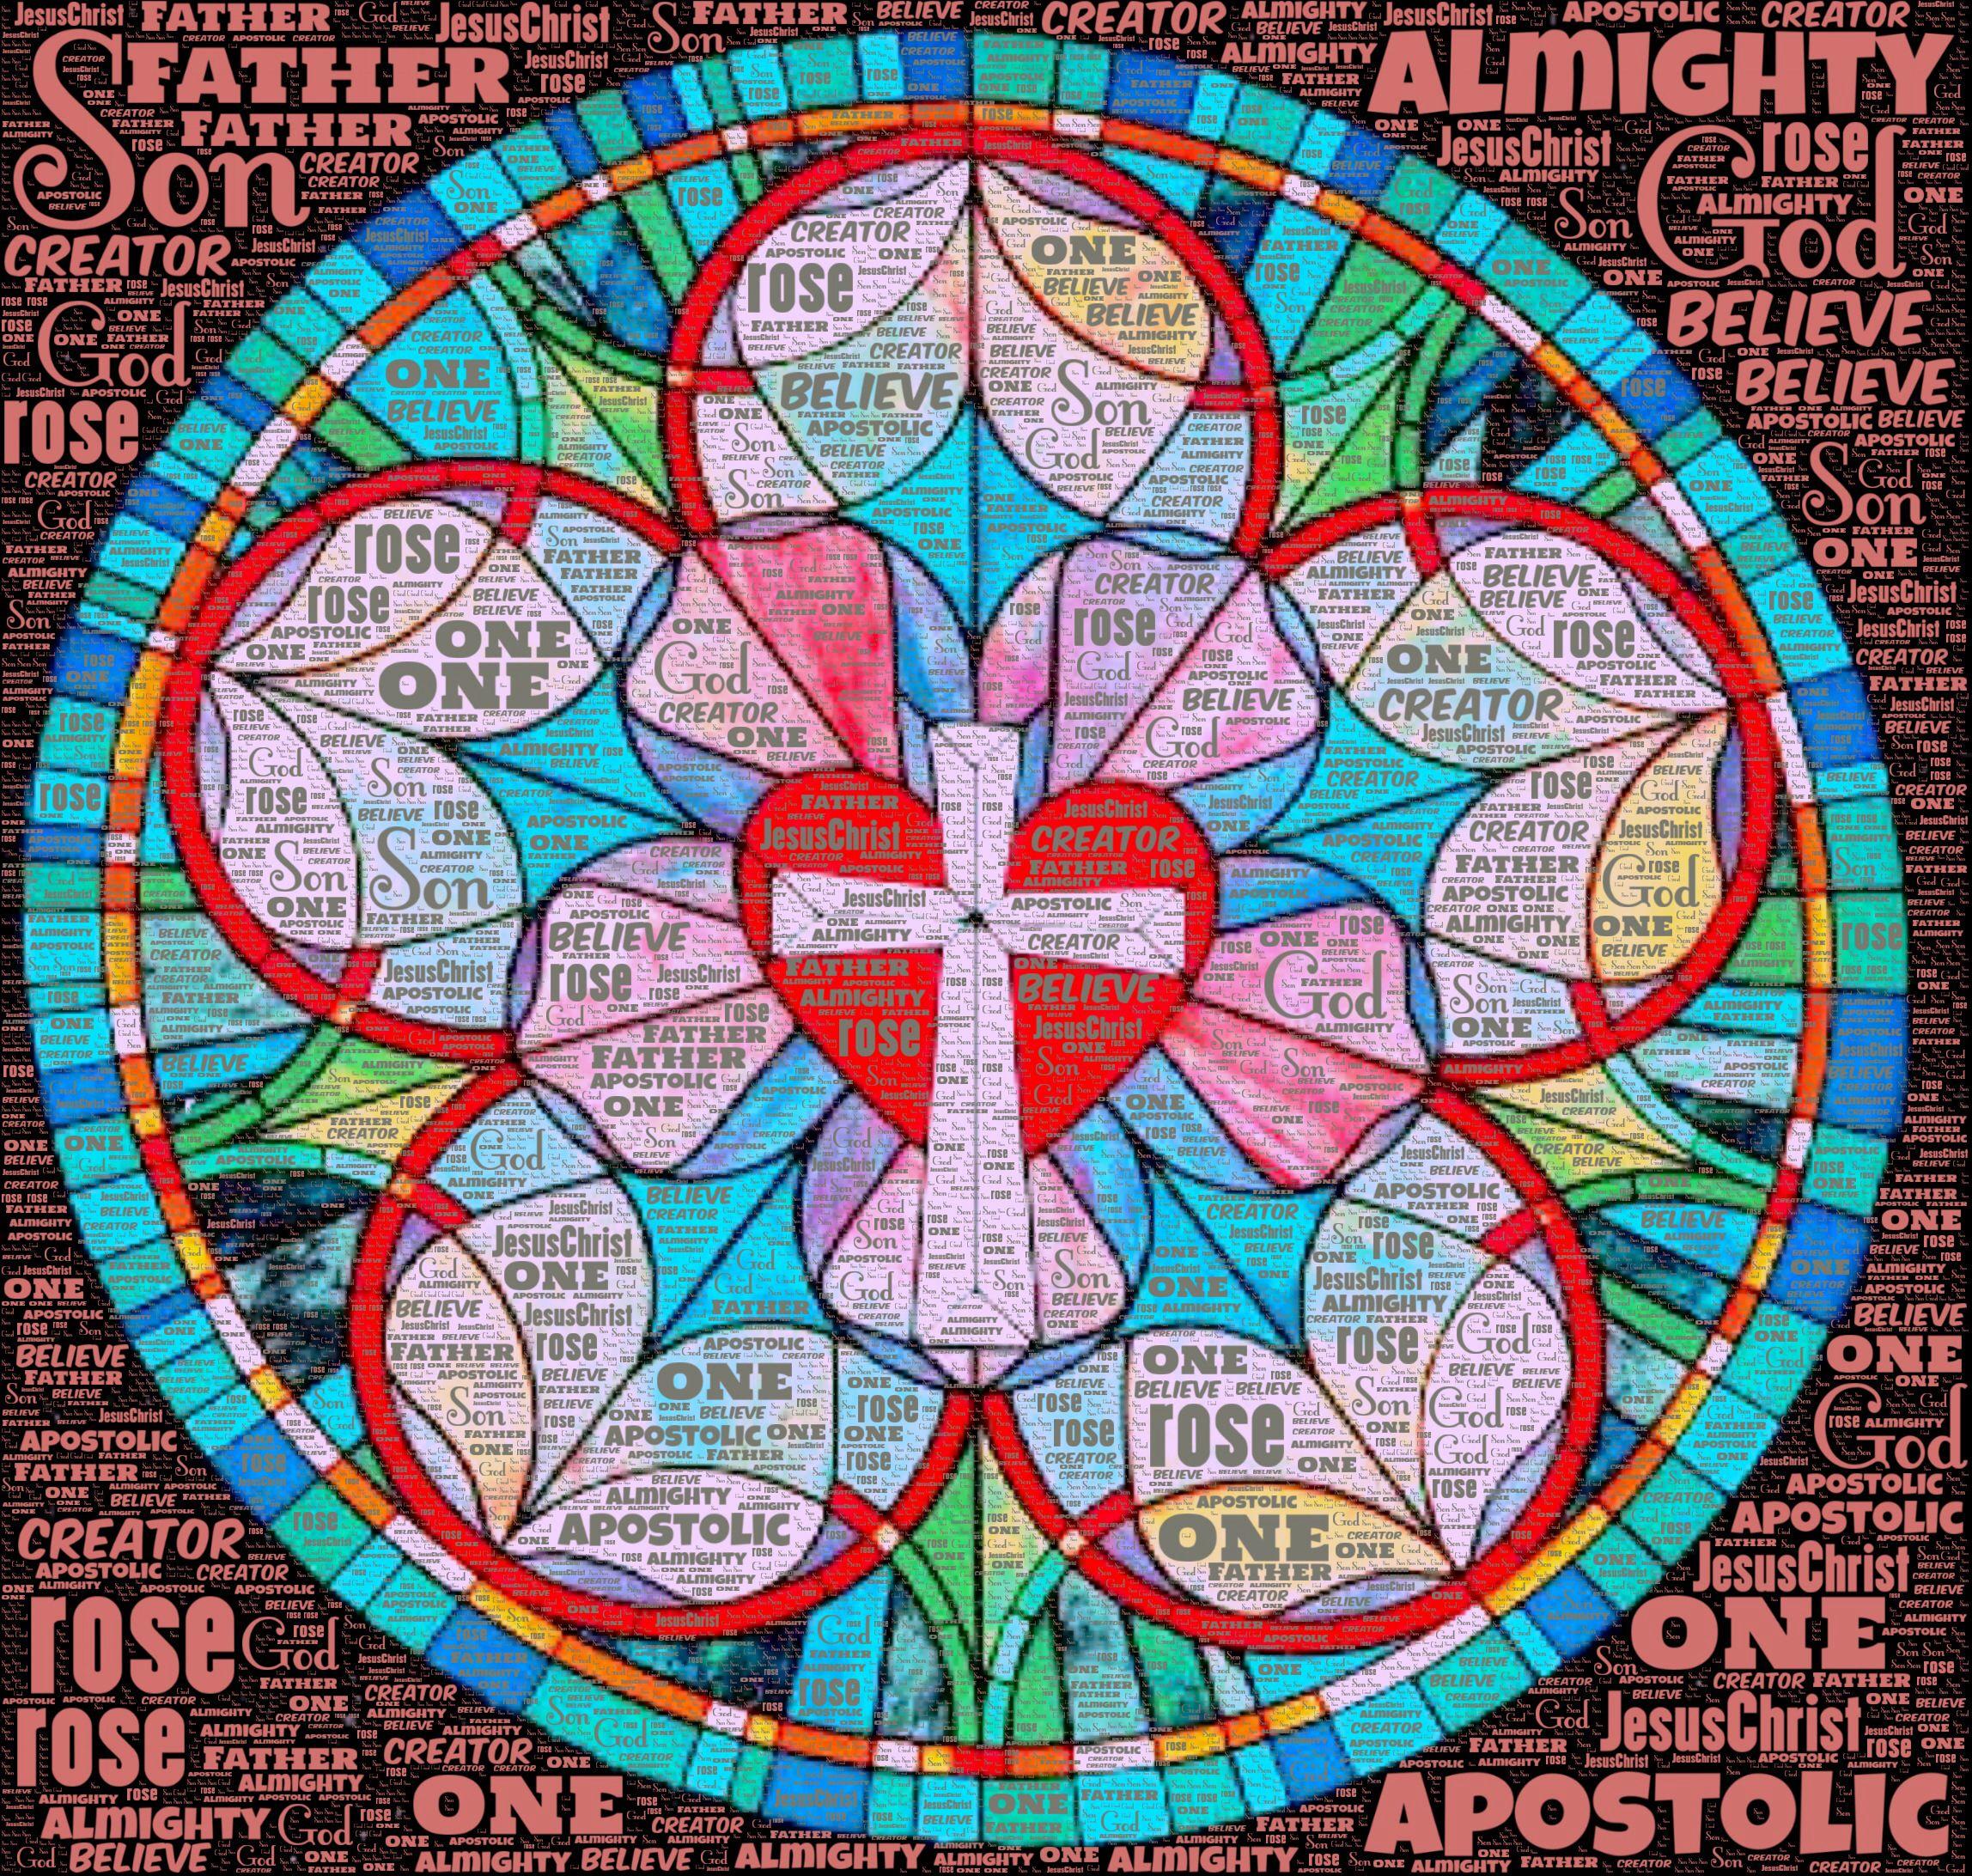 Apostle S Creed